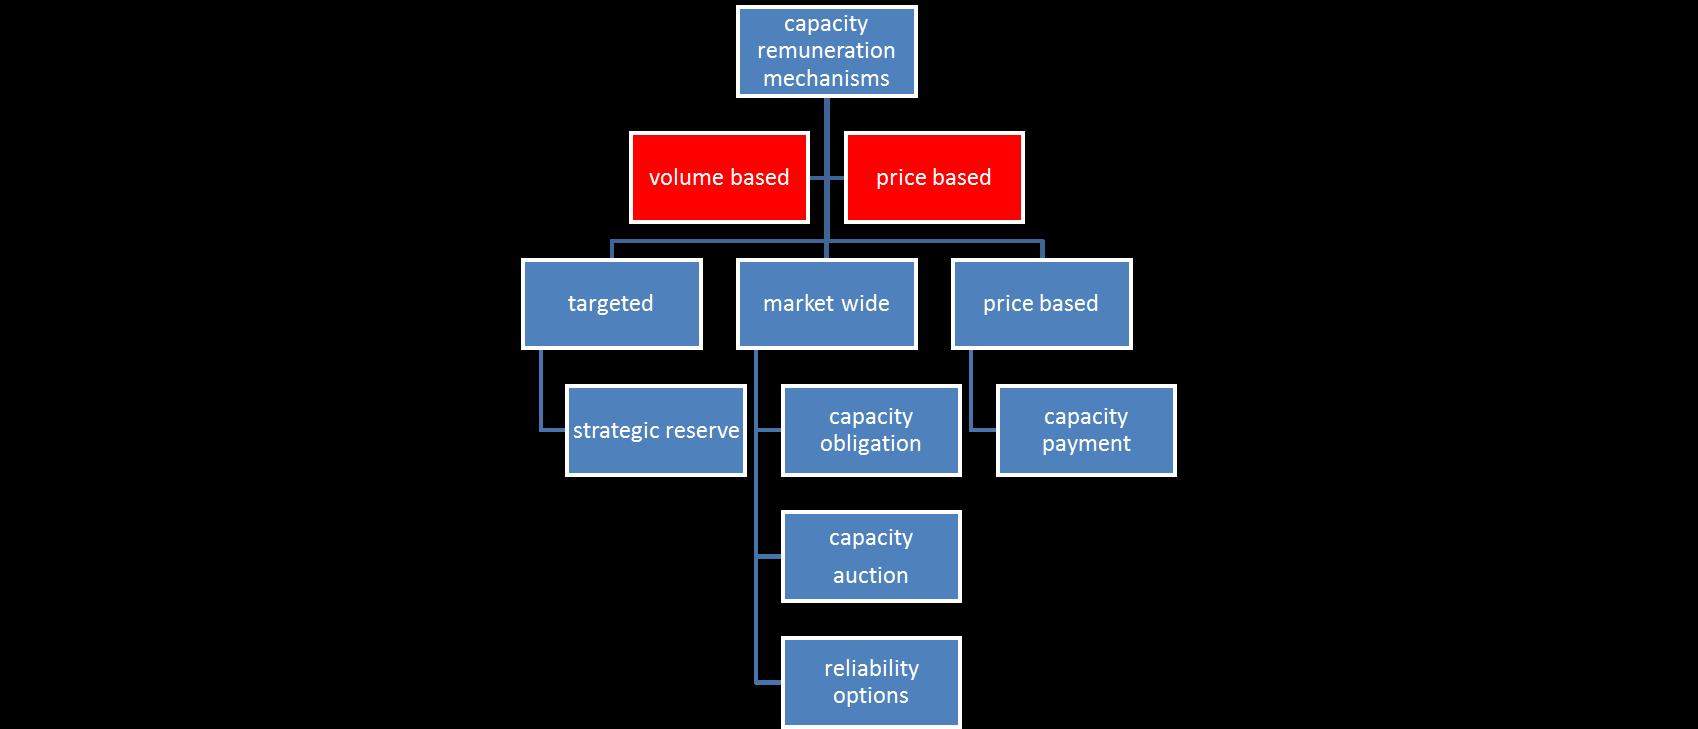 Five types of capacity mechanisms